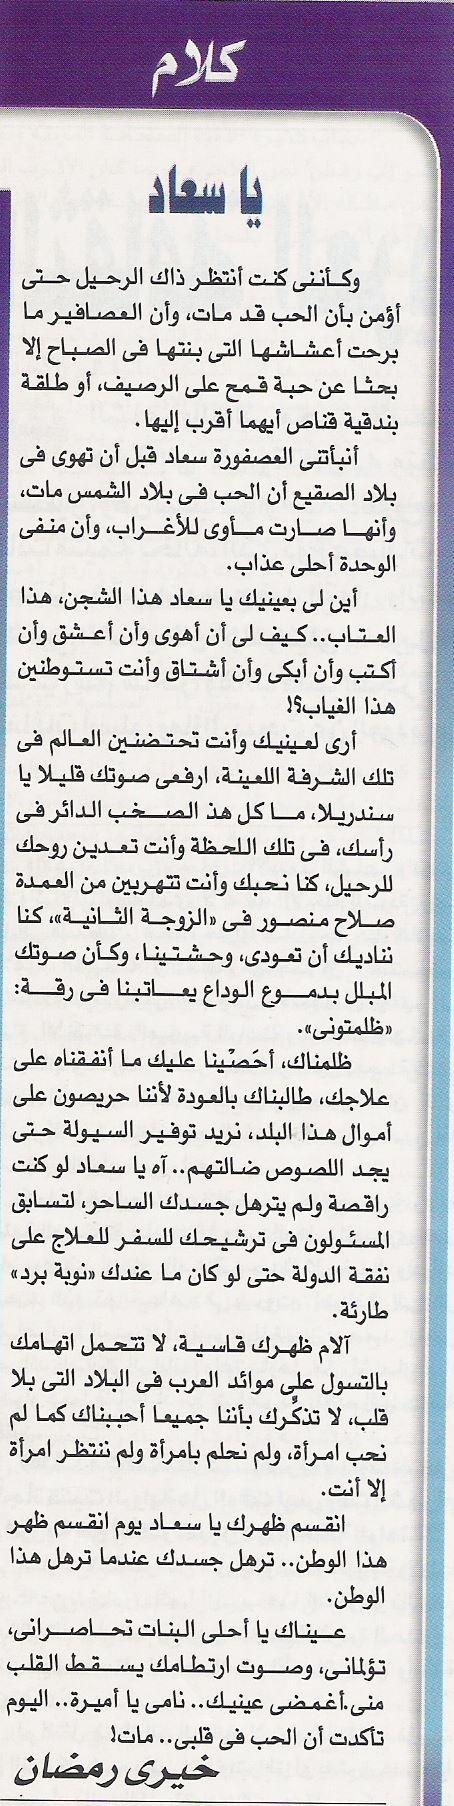 مقال - مقال صحفي : يا سعاد ... بقلم خيري رمضان 2010 م (؟) O_c__o10